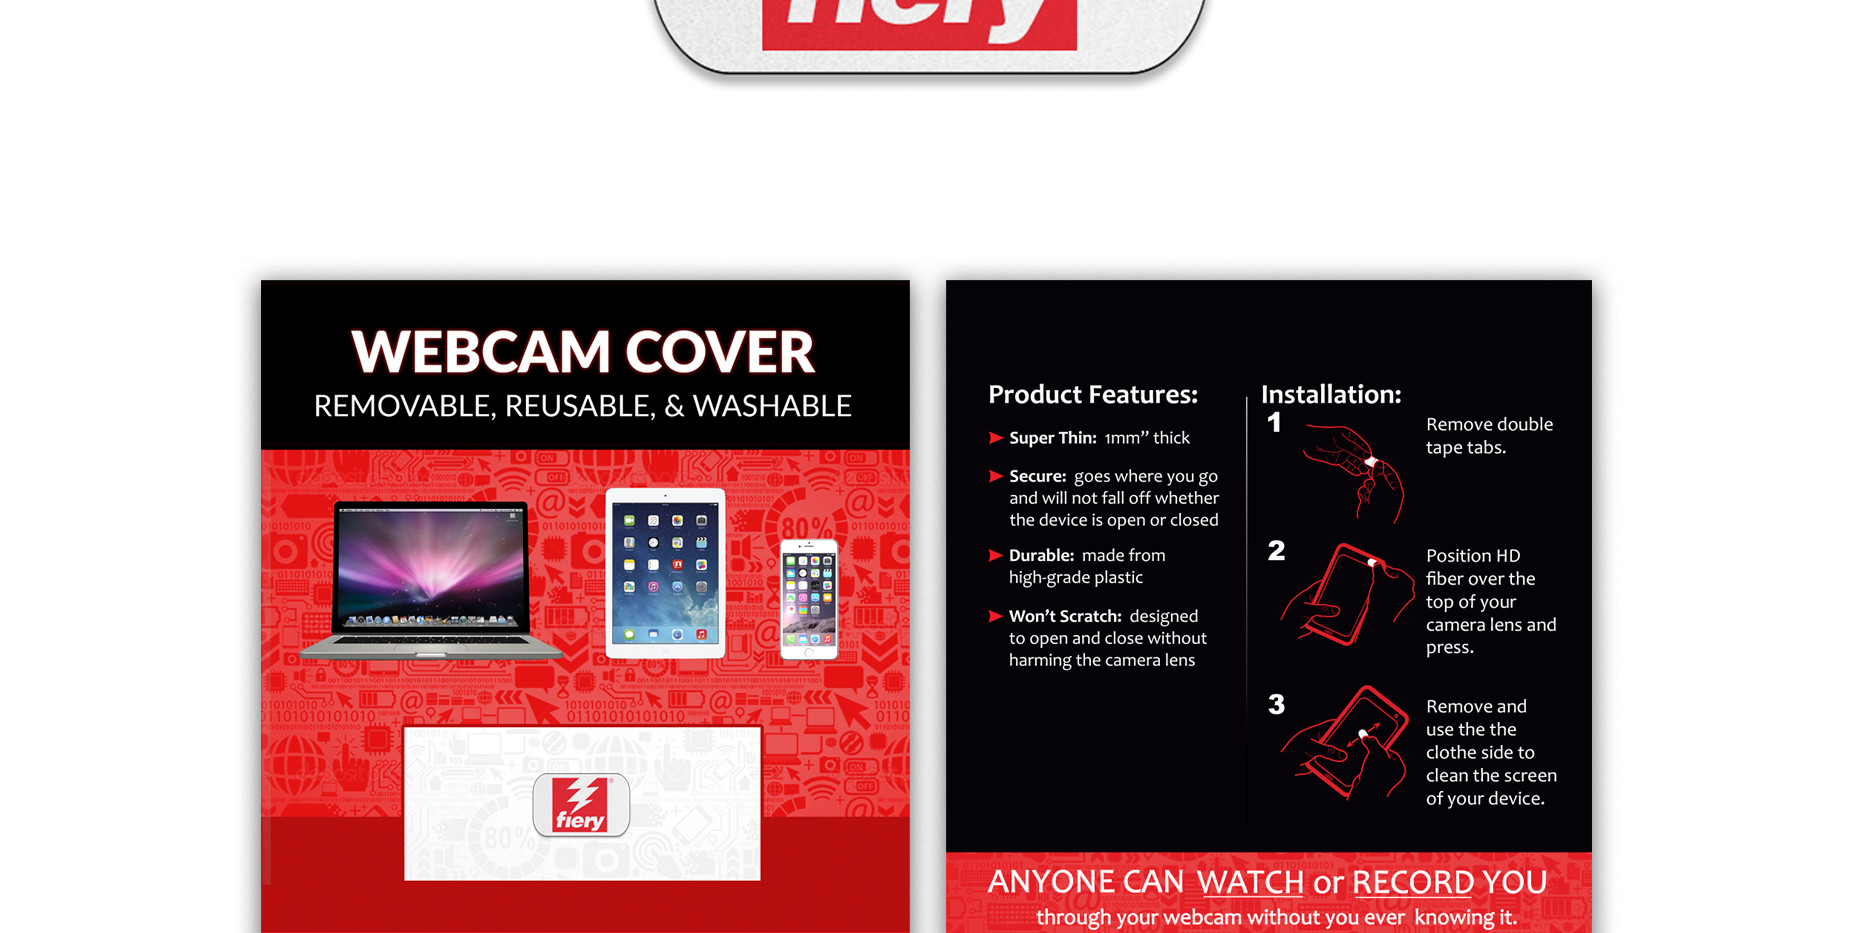 Fiery HD Fiber Phone card standard white